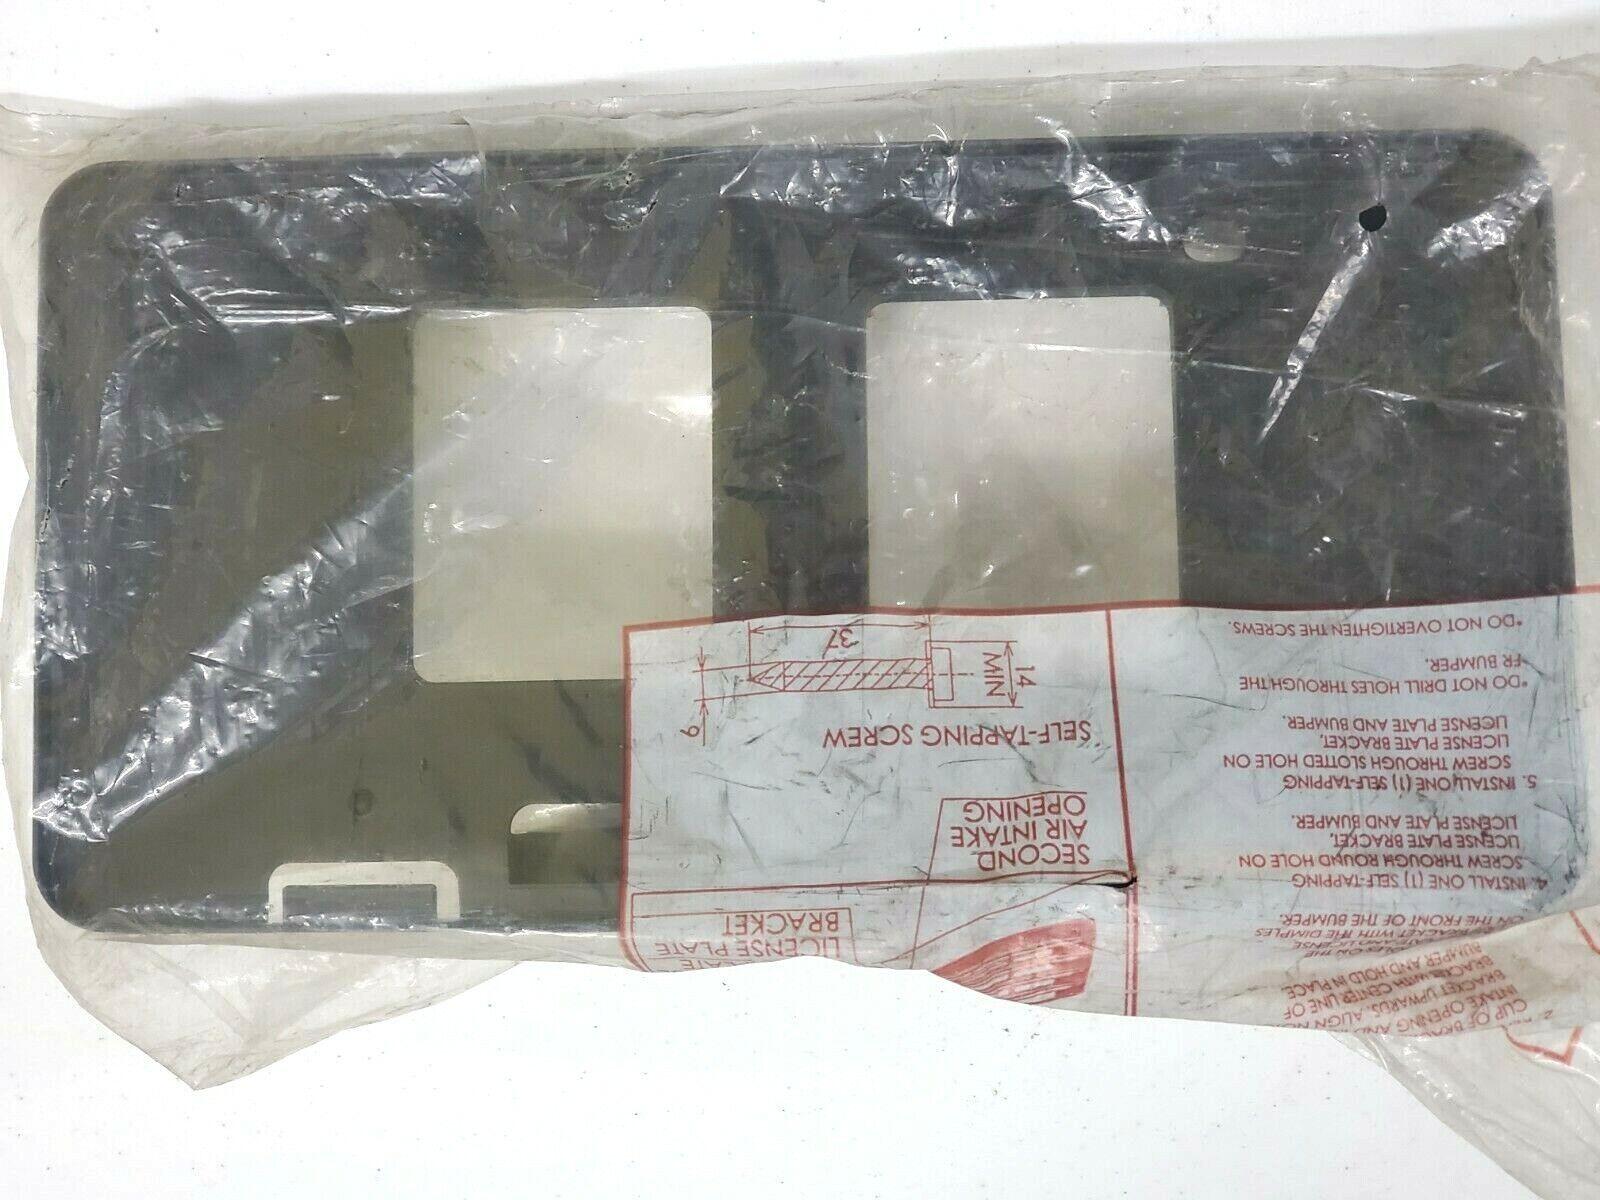 OEM TOYOTA CAMRY SE FRONT LICENSE PLATE HOLDER  52114-06170 FITS 2012-2014